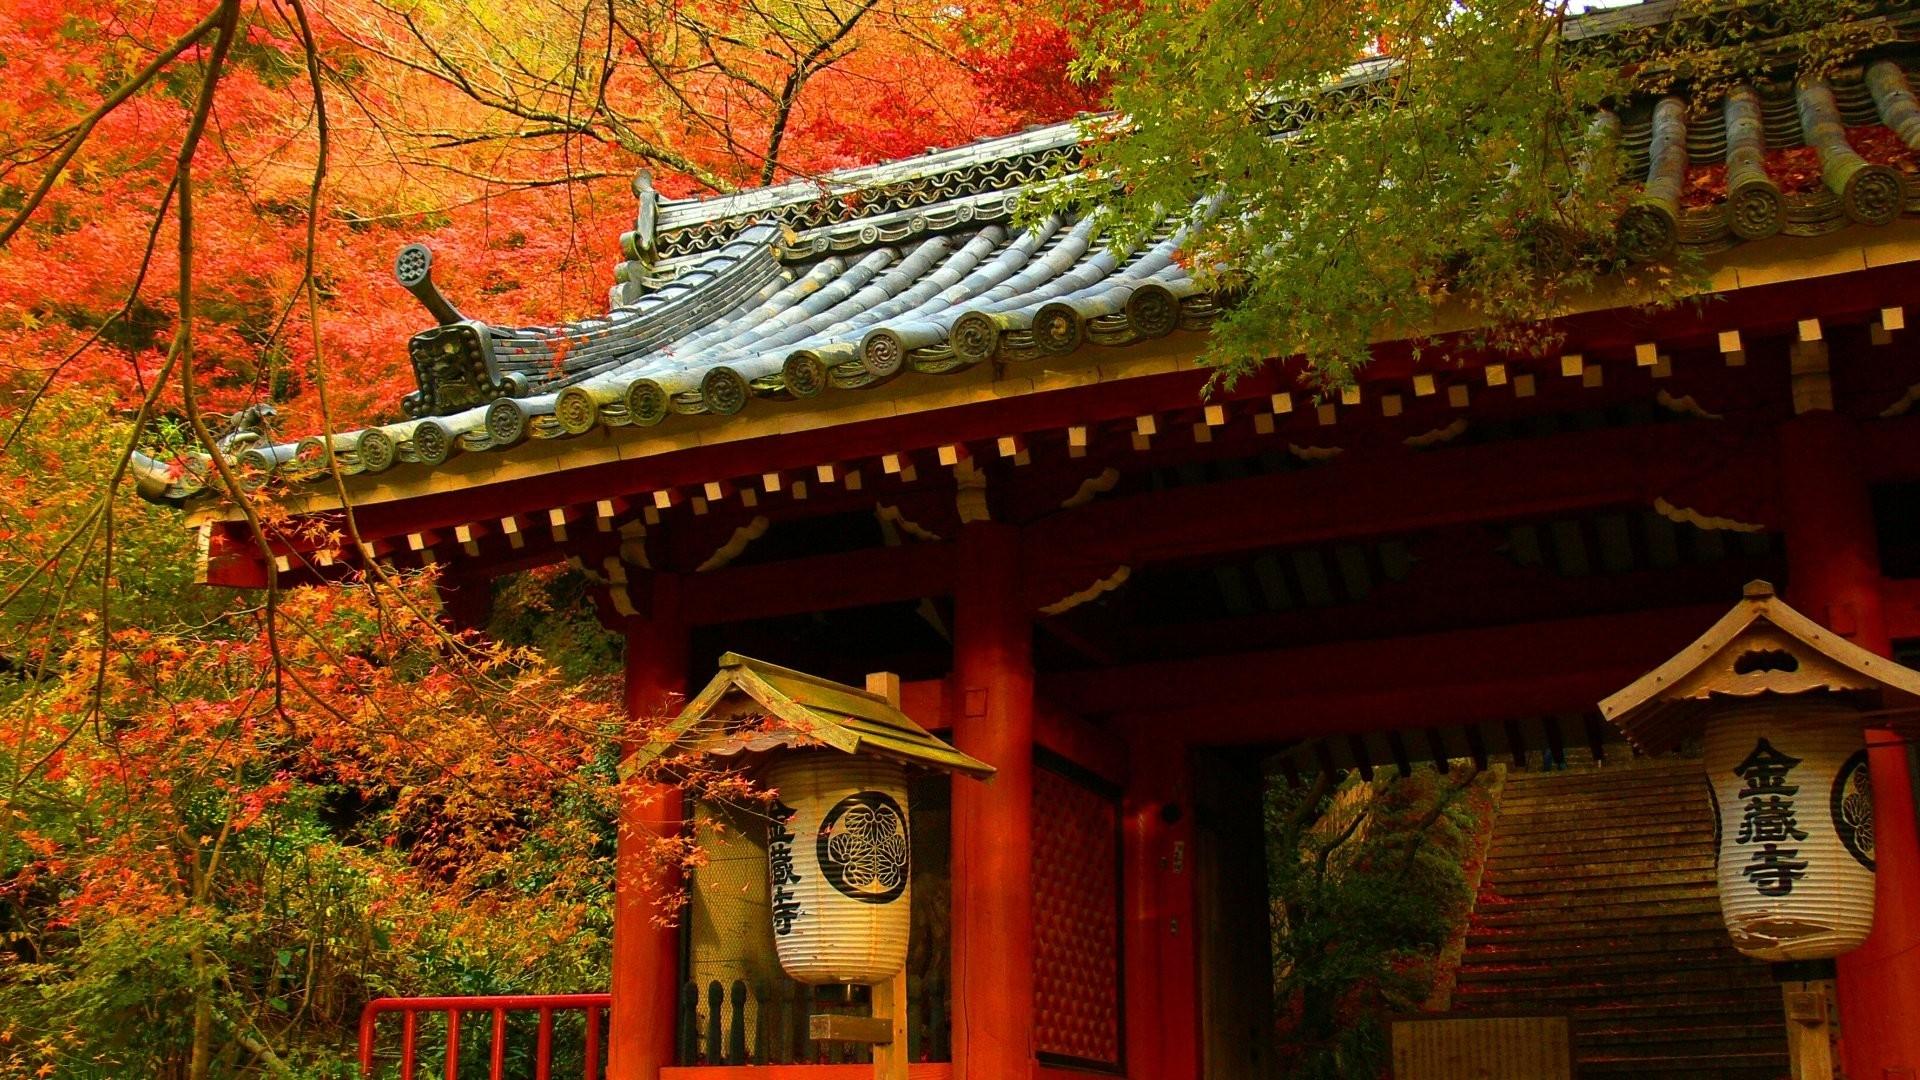 japan architecture wallpaper - photo #18